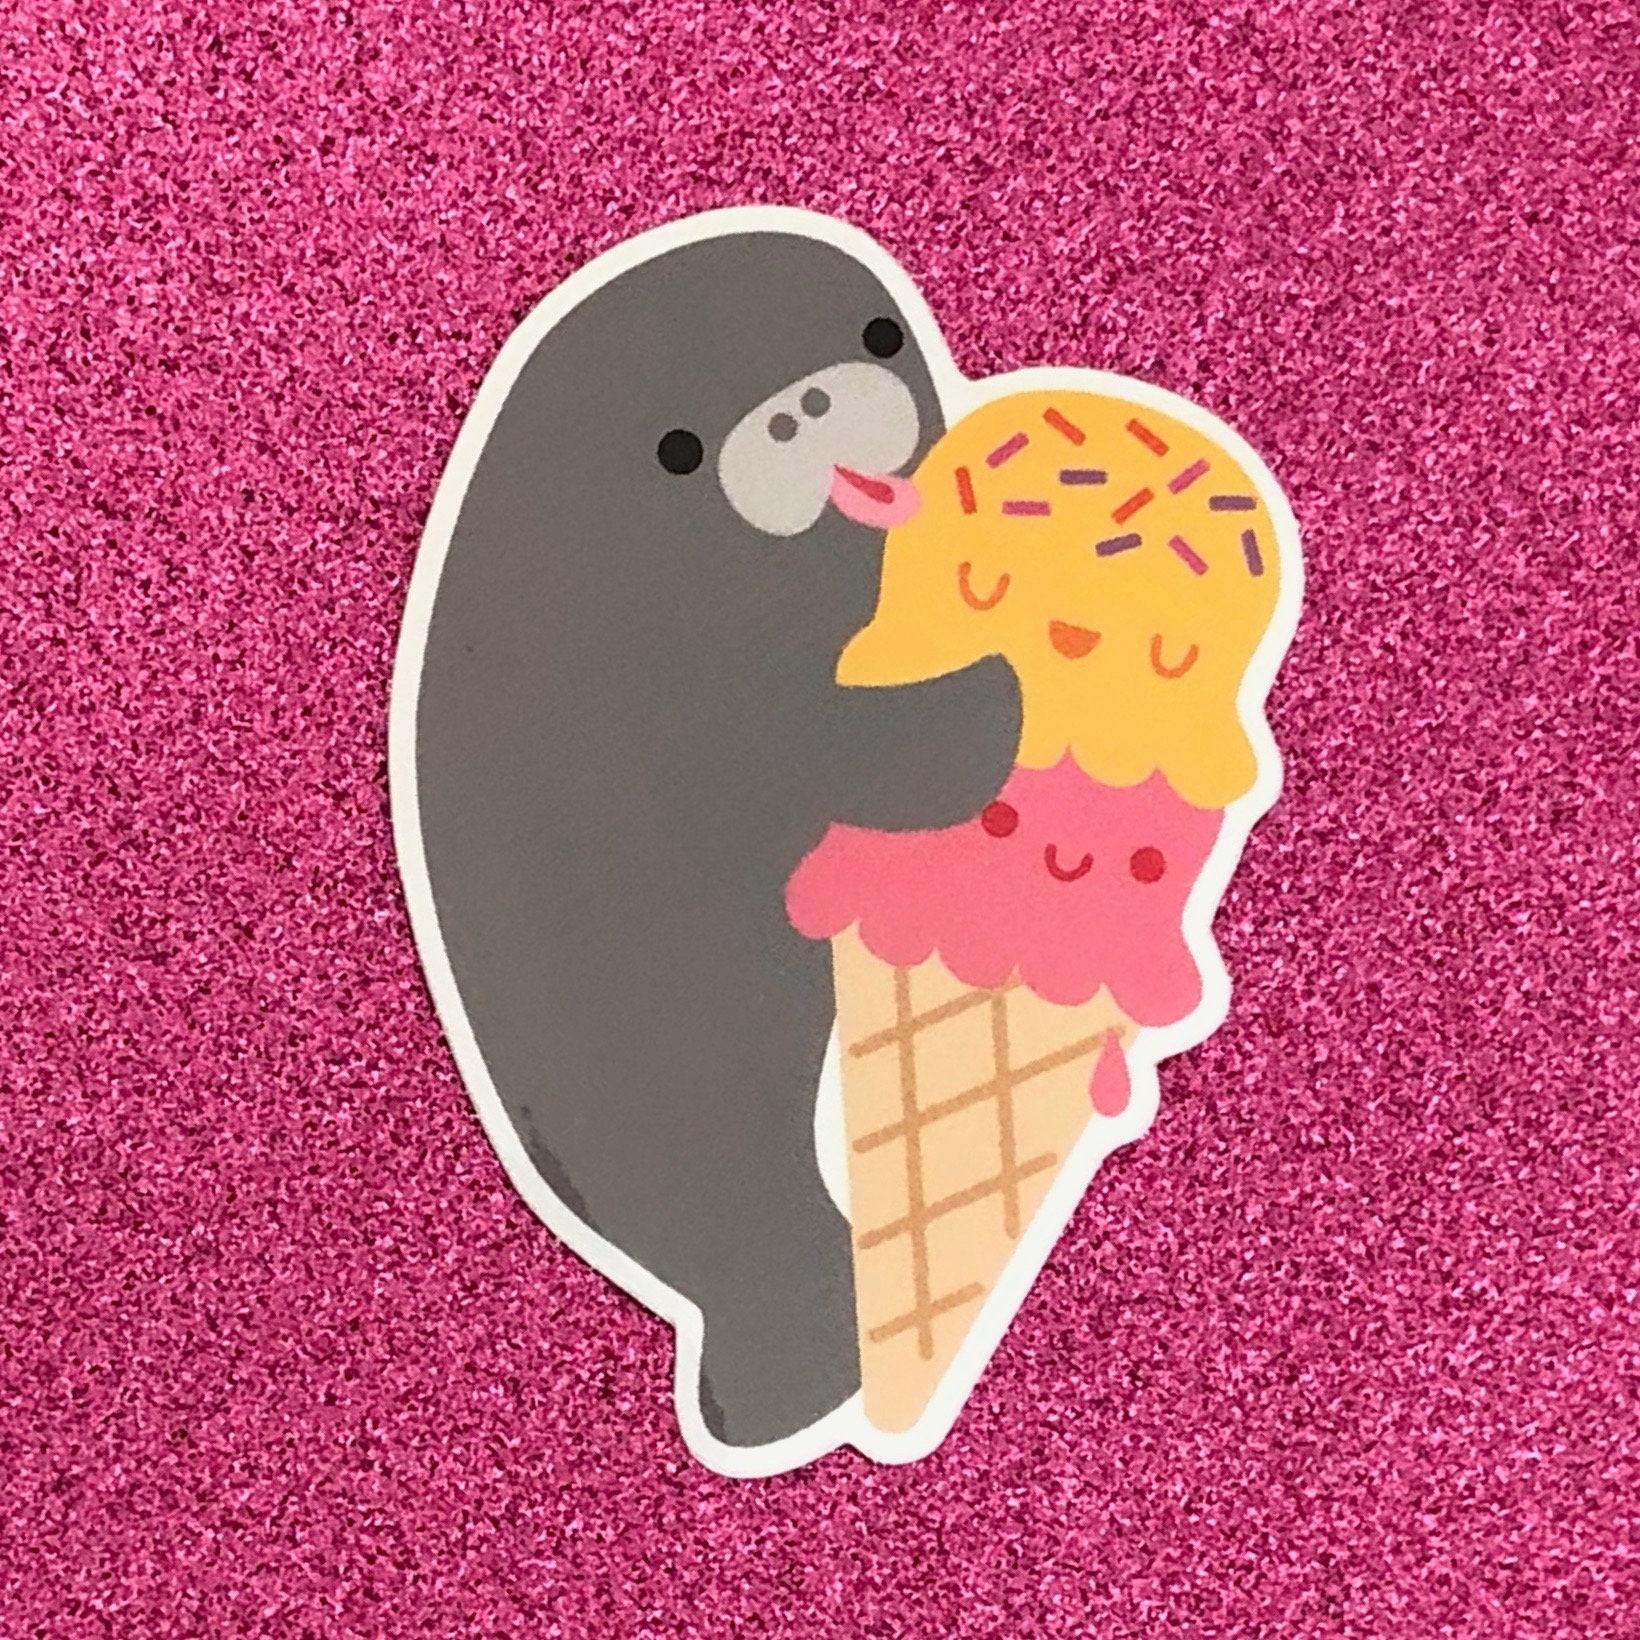 Manatee & Ice Cream Vinyl Sticker | Etsy